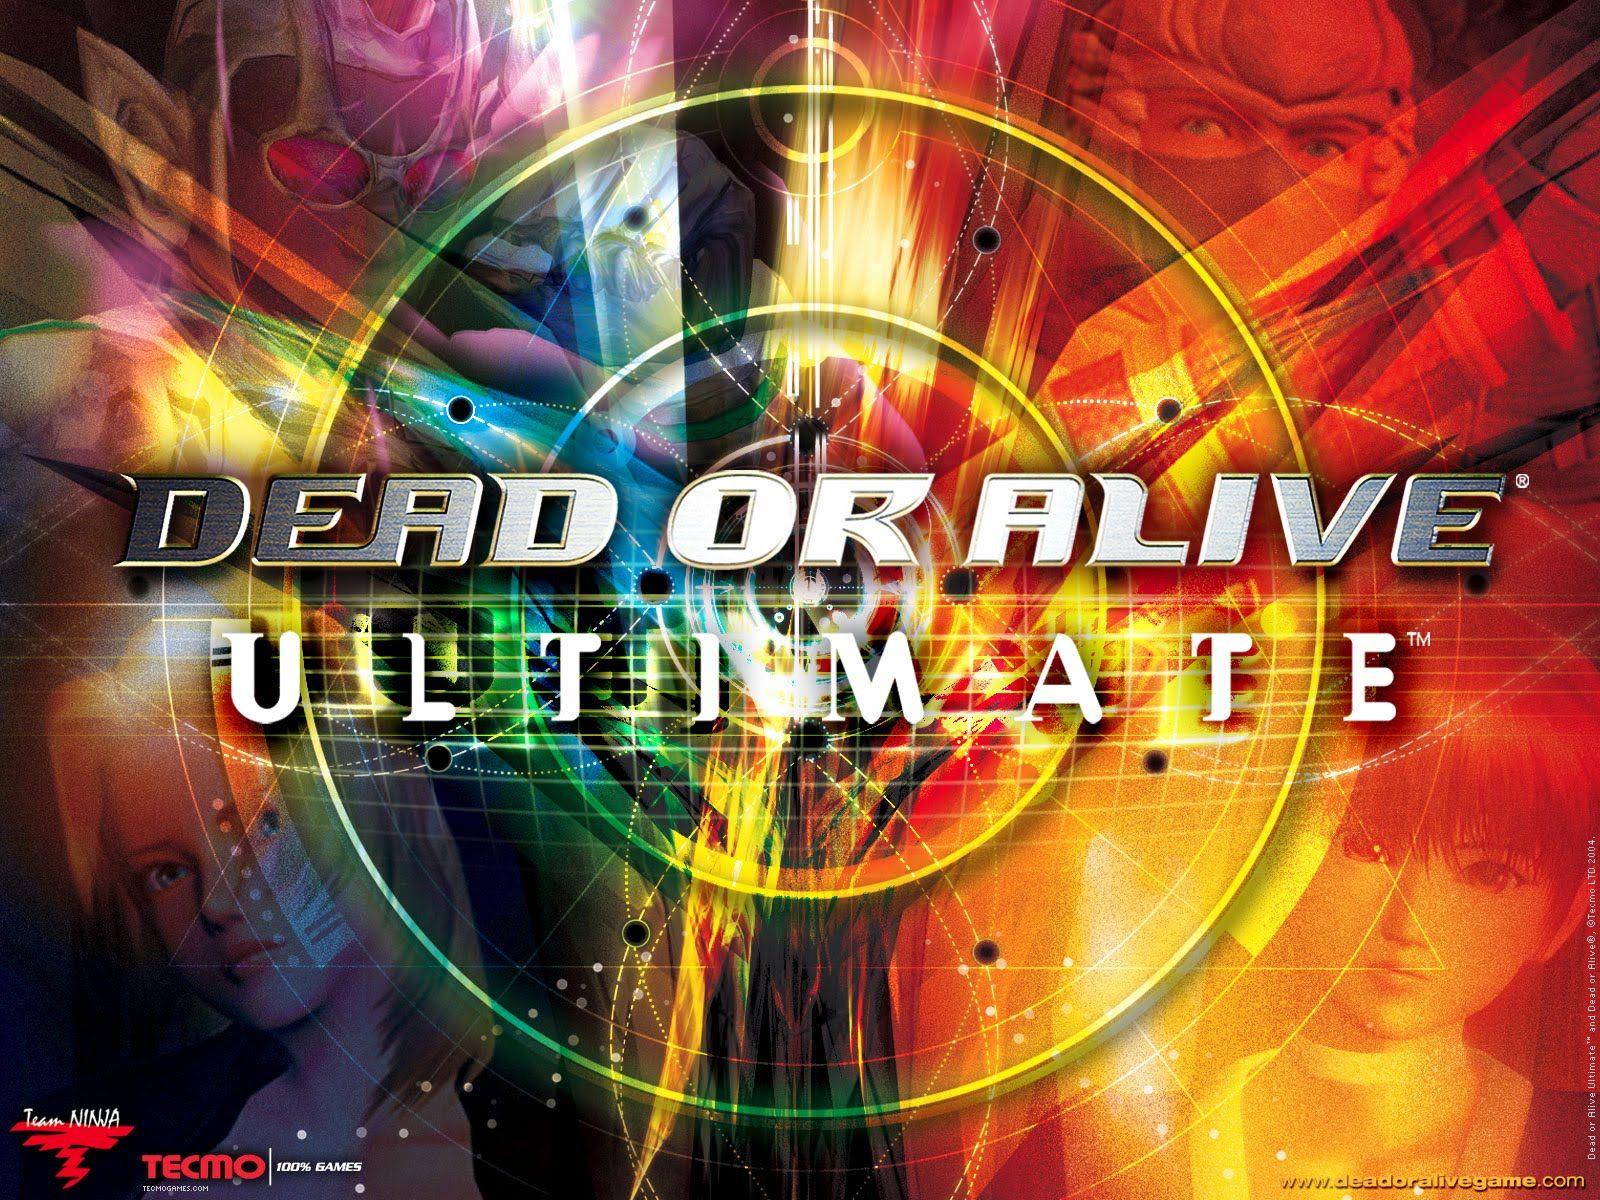 Dead or alive 2 ultimate walkthrough ayane xbox dead